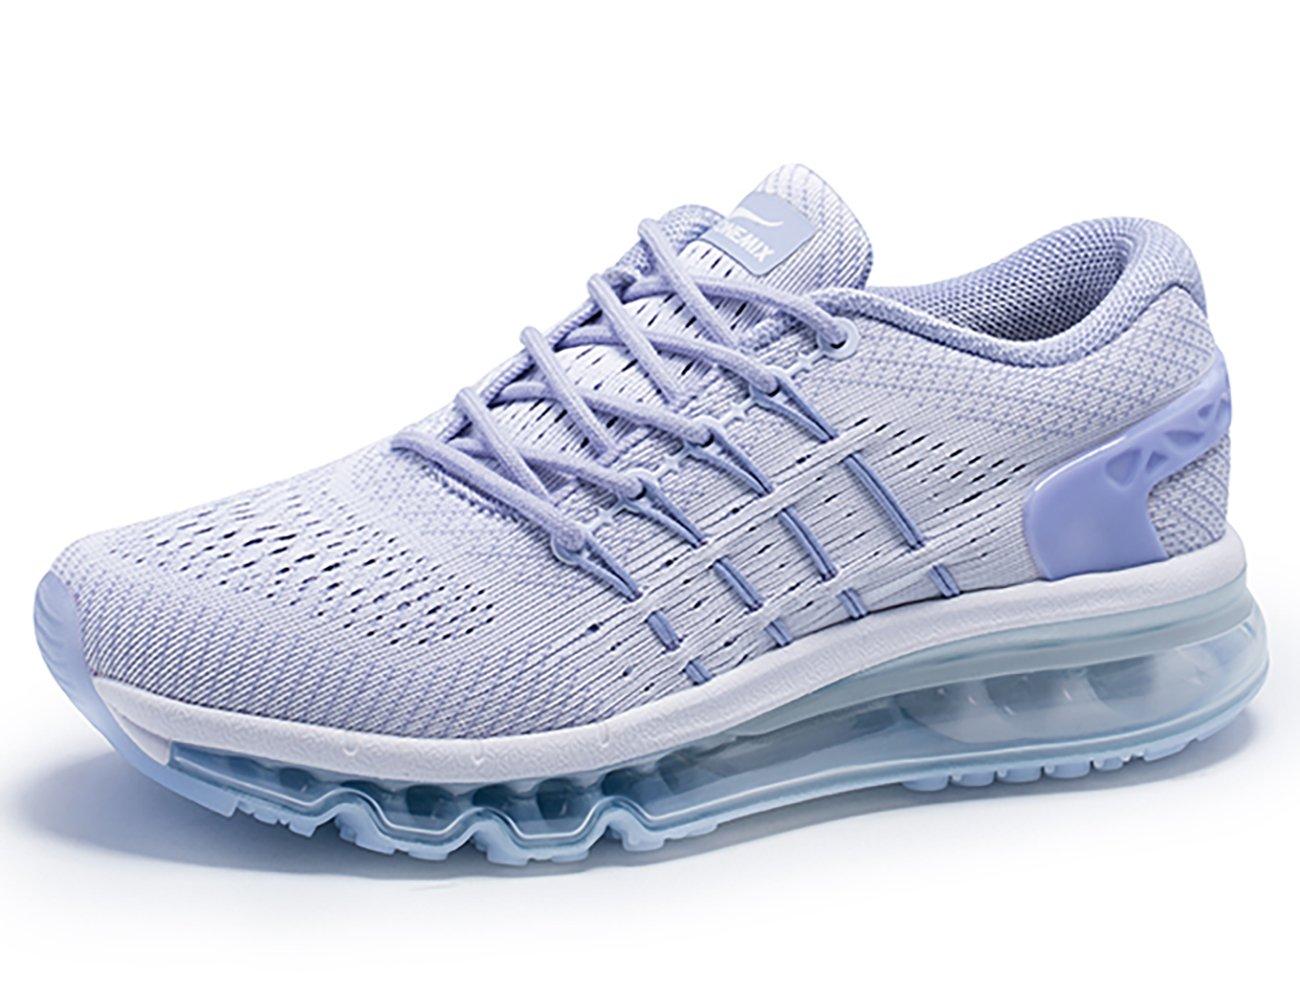 ONEMIX Womens Air Running Shoes,Sloping Tongue Design Sneakers B074TC7G3J Womens 8.5(M)/Mens 7(M)US 40EU White